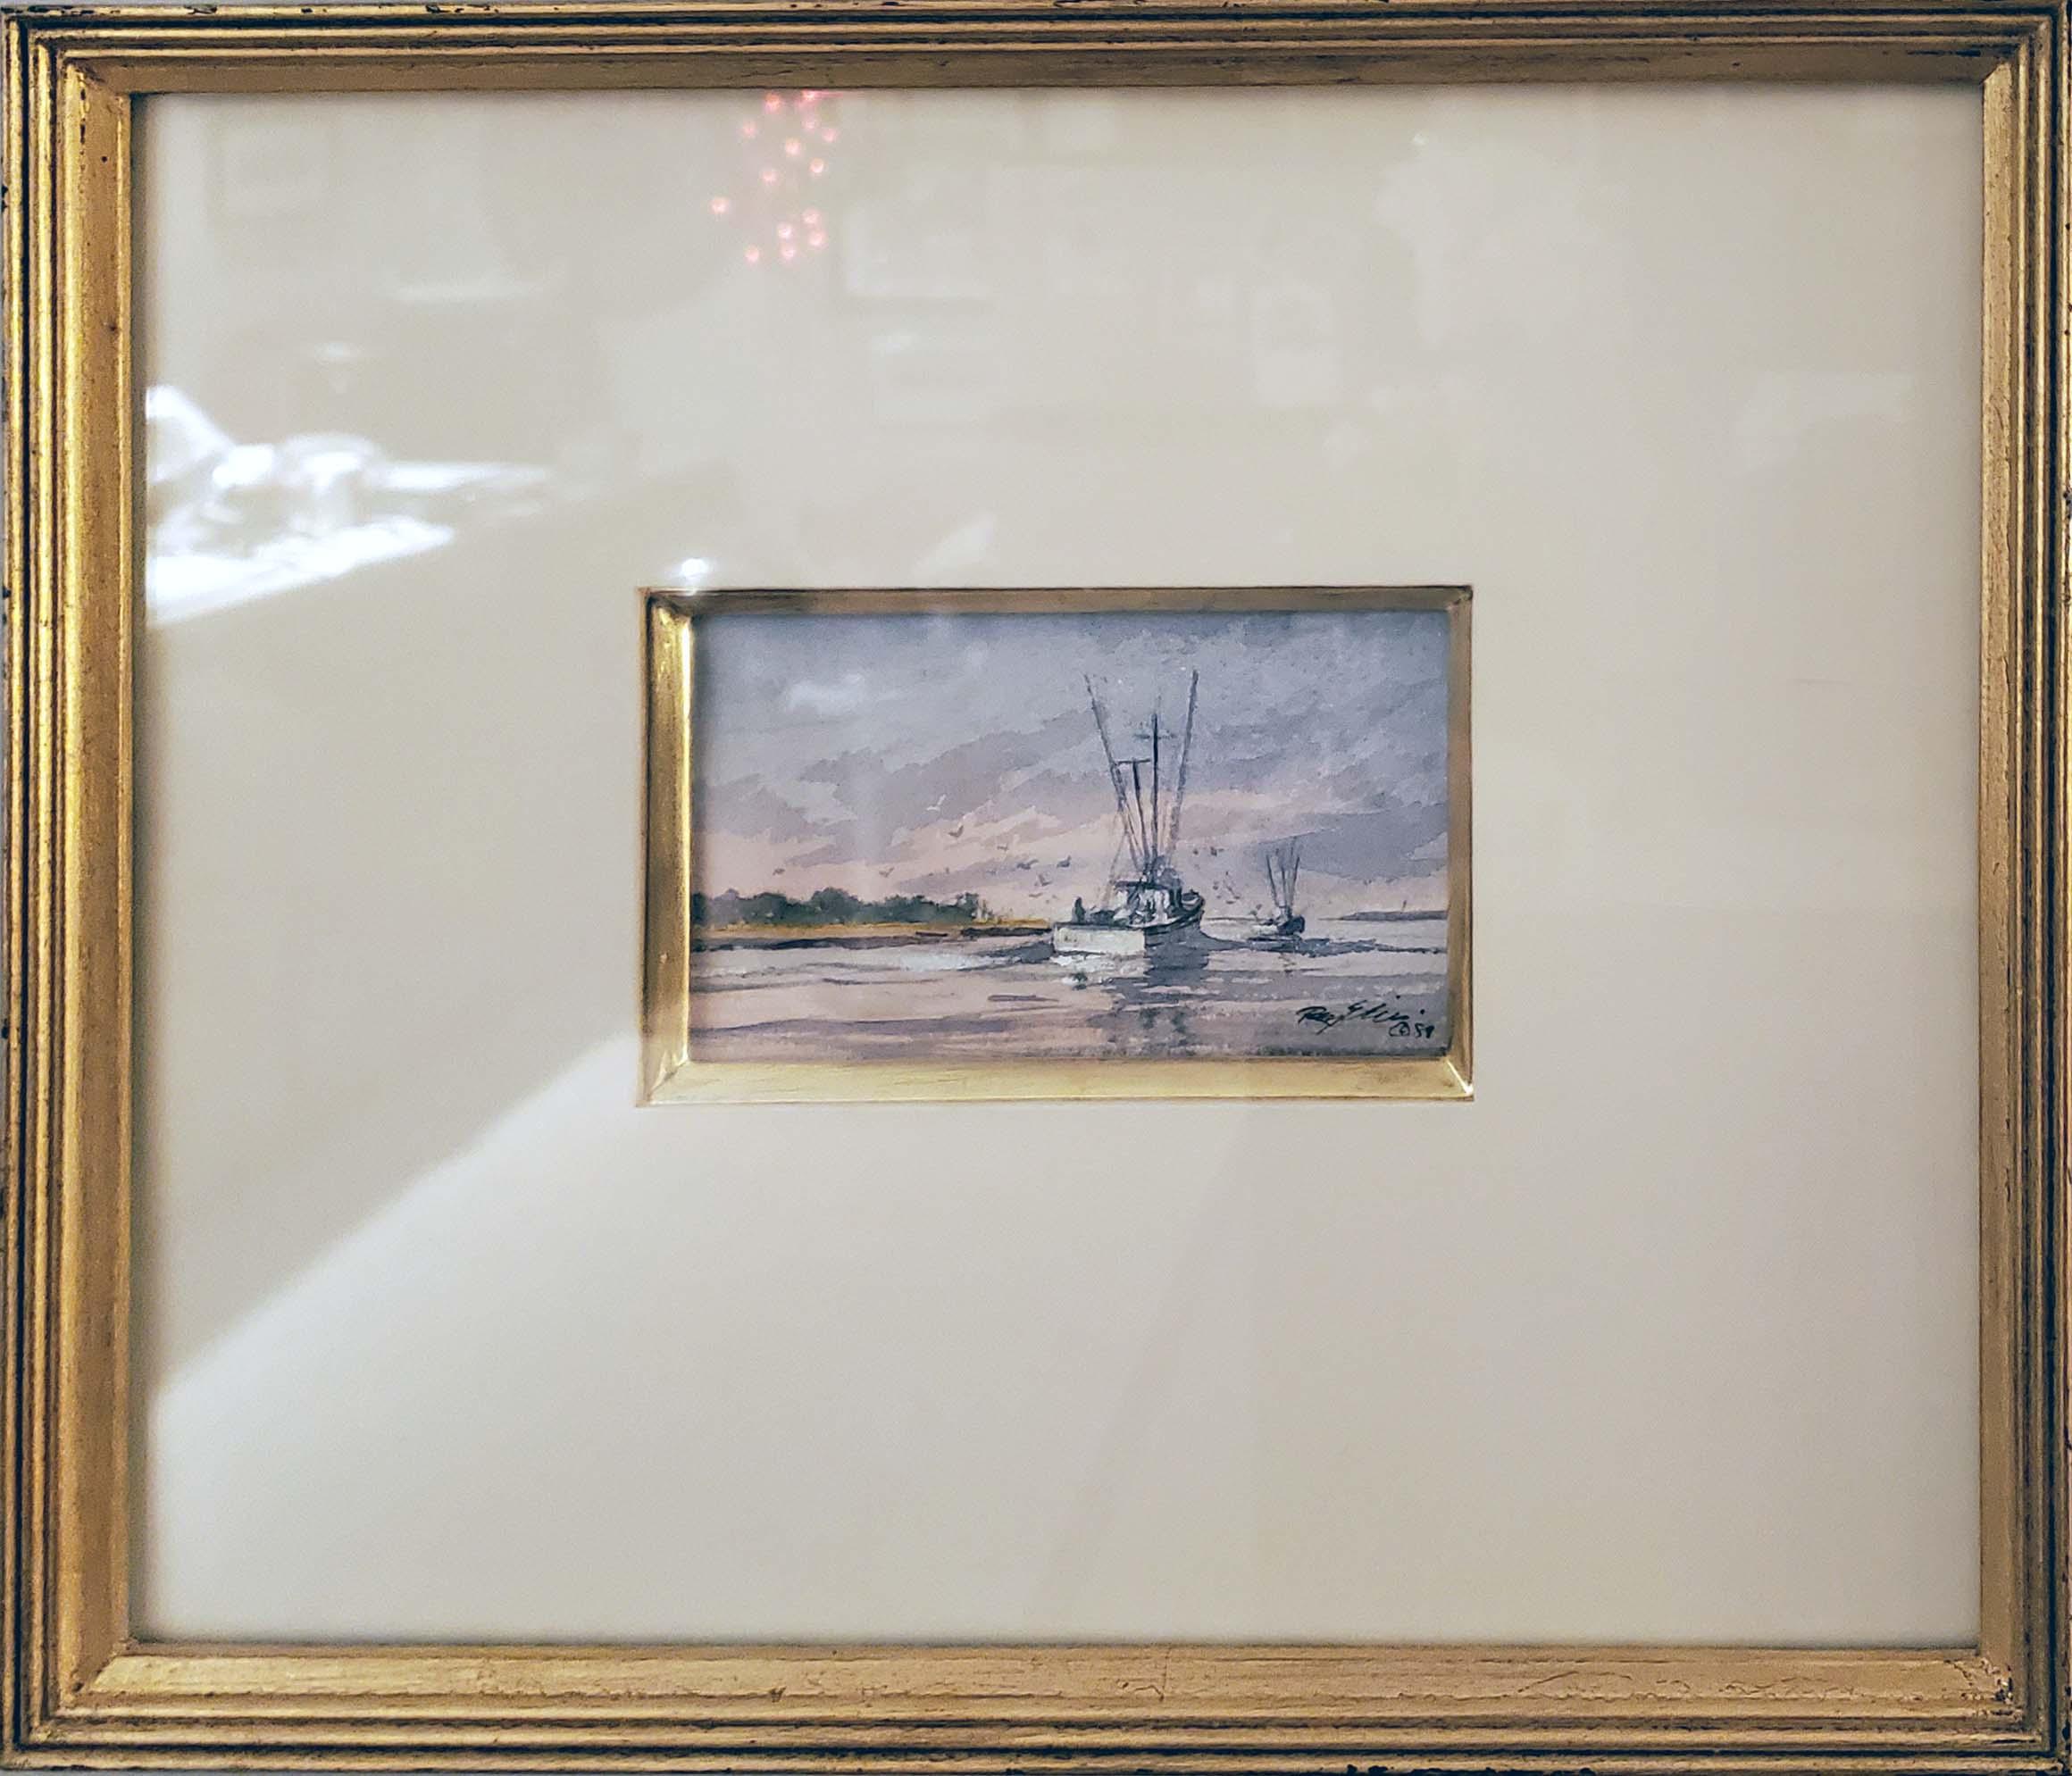 Returning Shrimper-framed